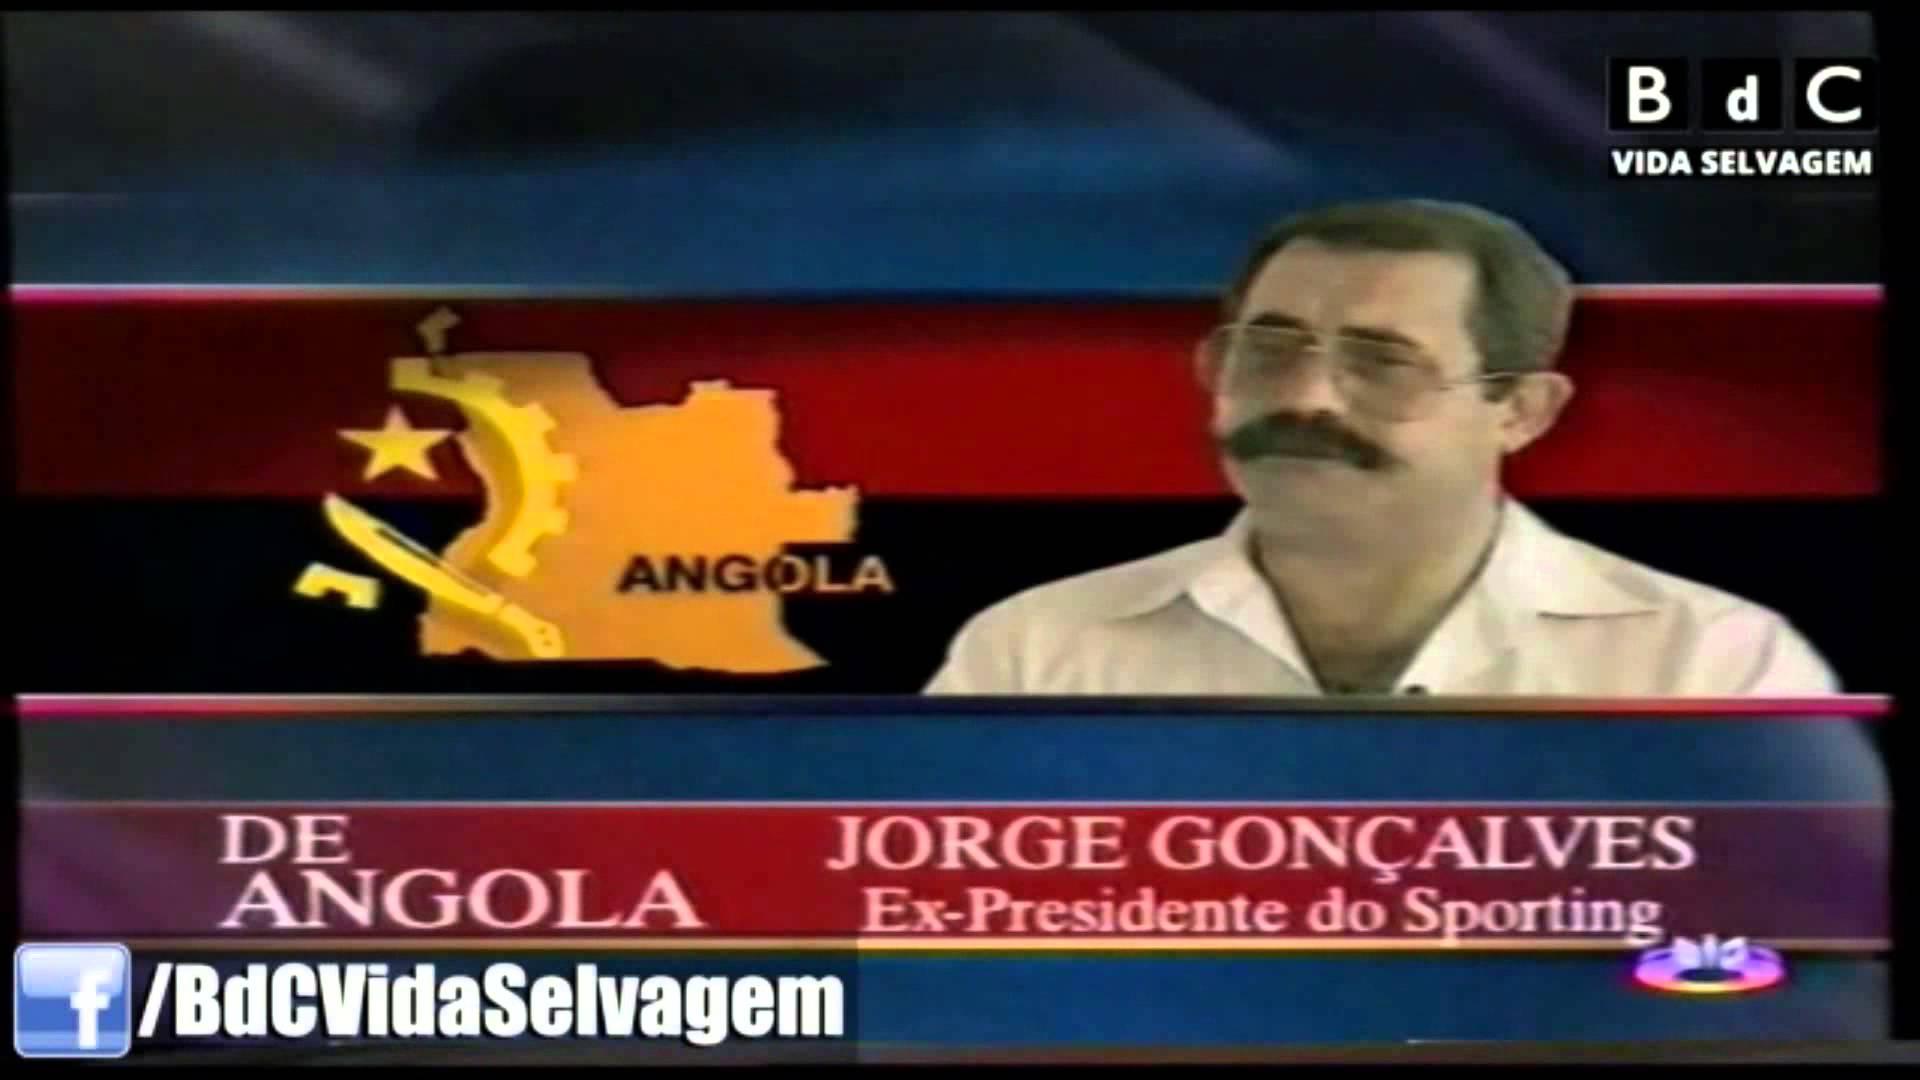 Video: Bomba! Antigo presidente do Sporting admite ter comprado árbitros